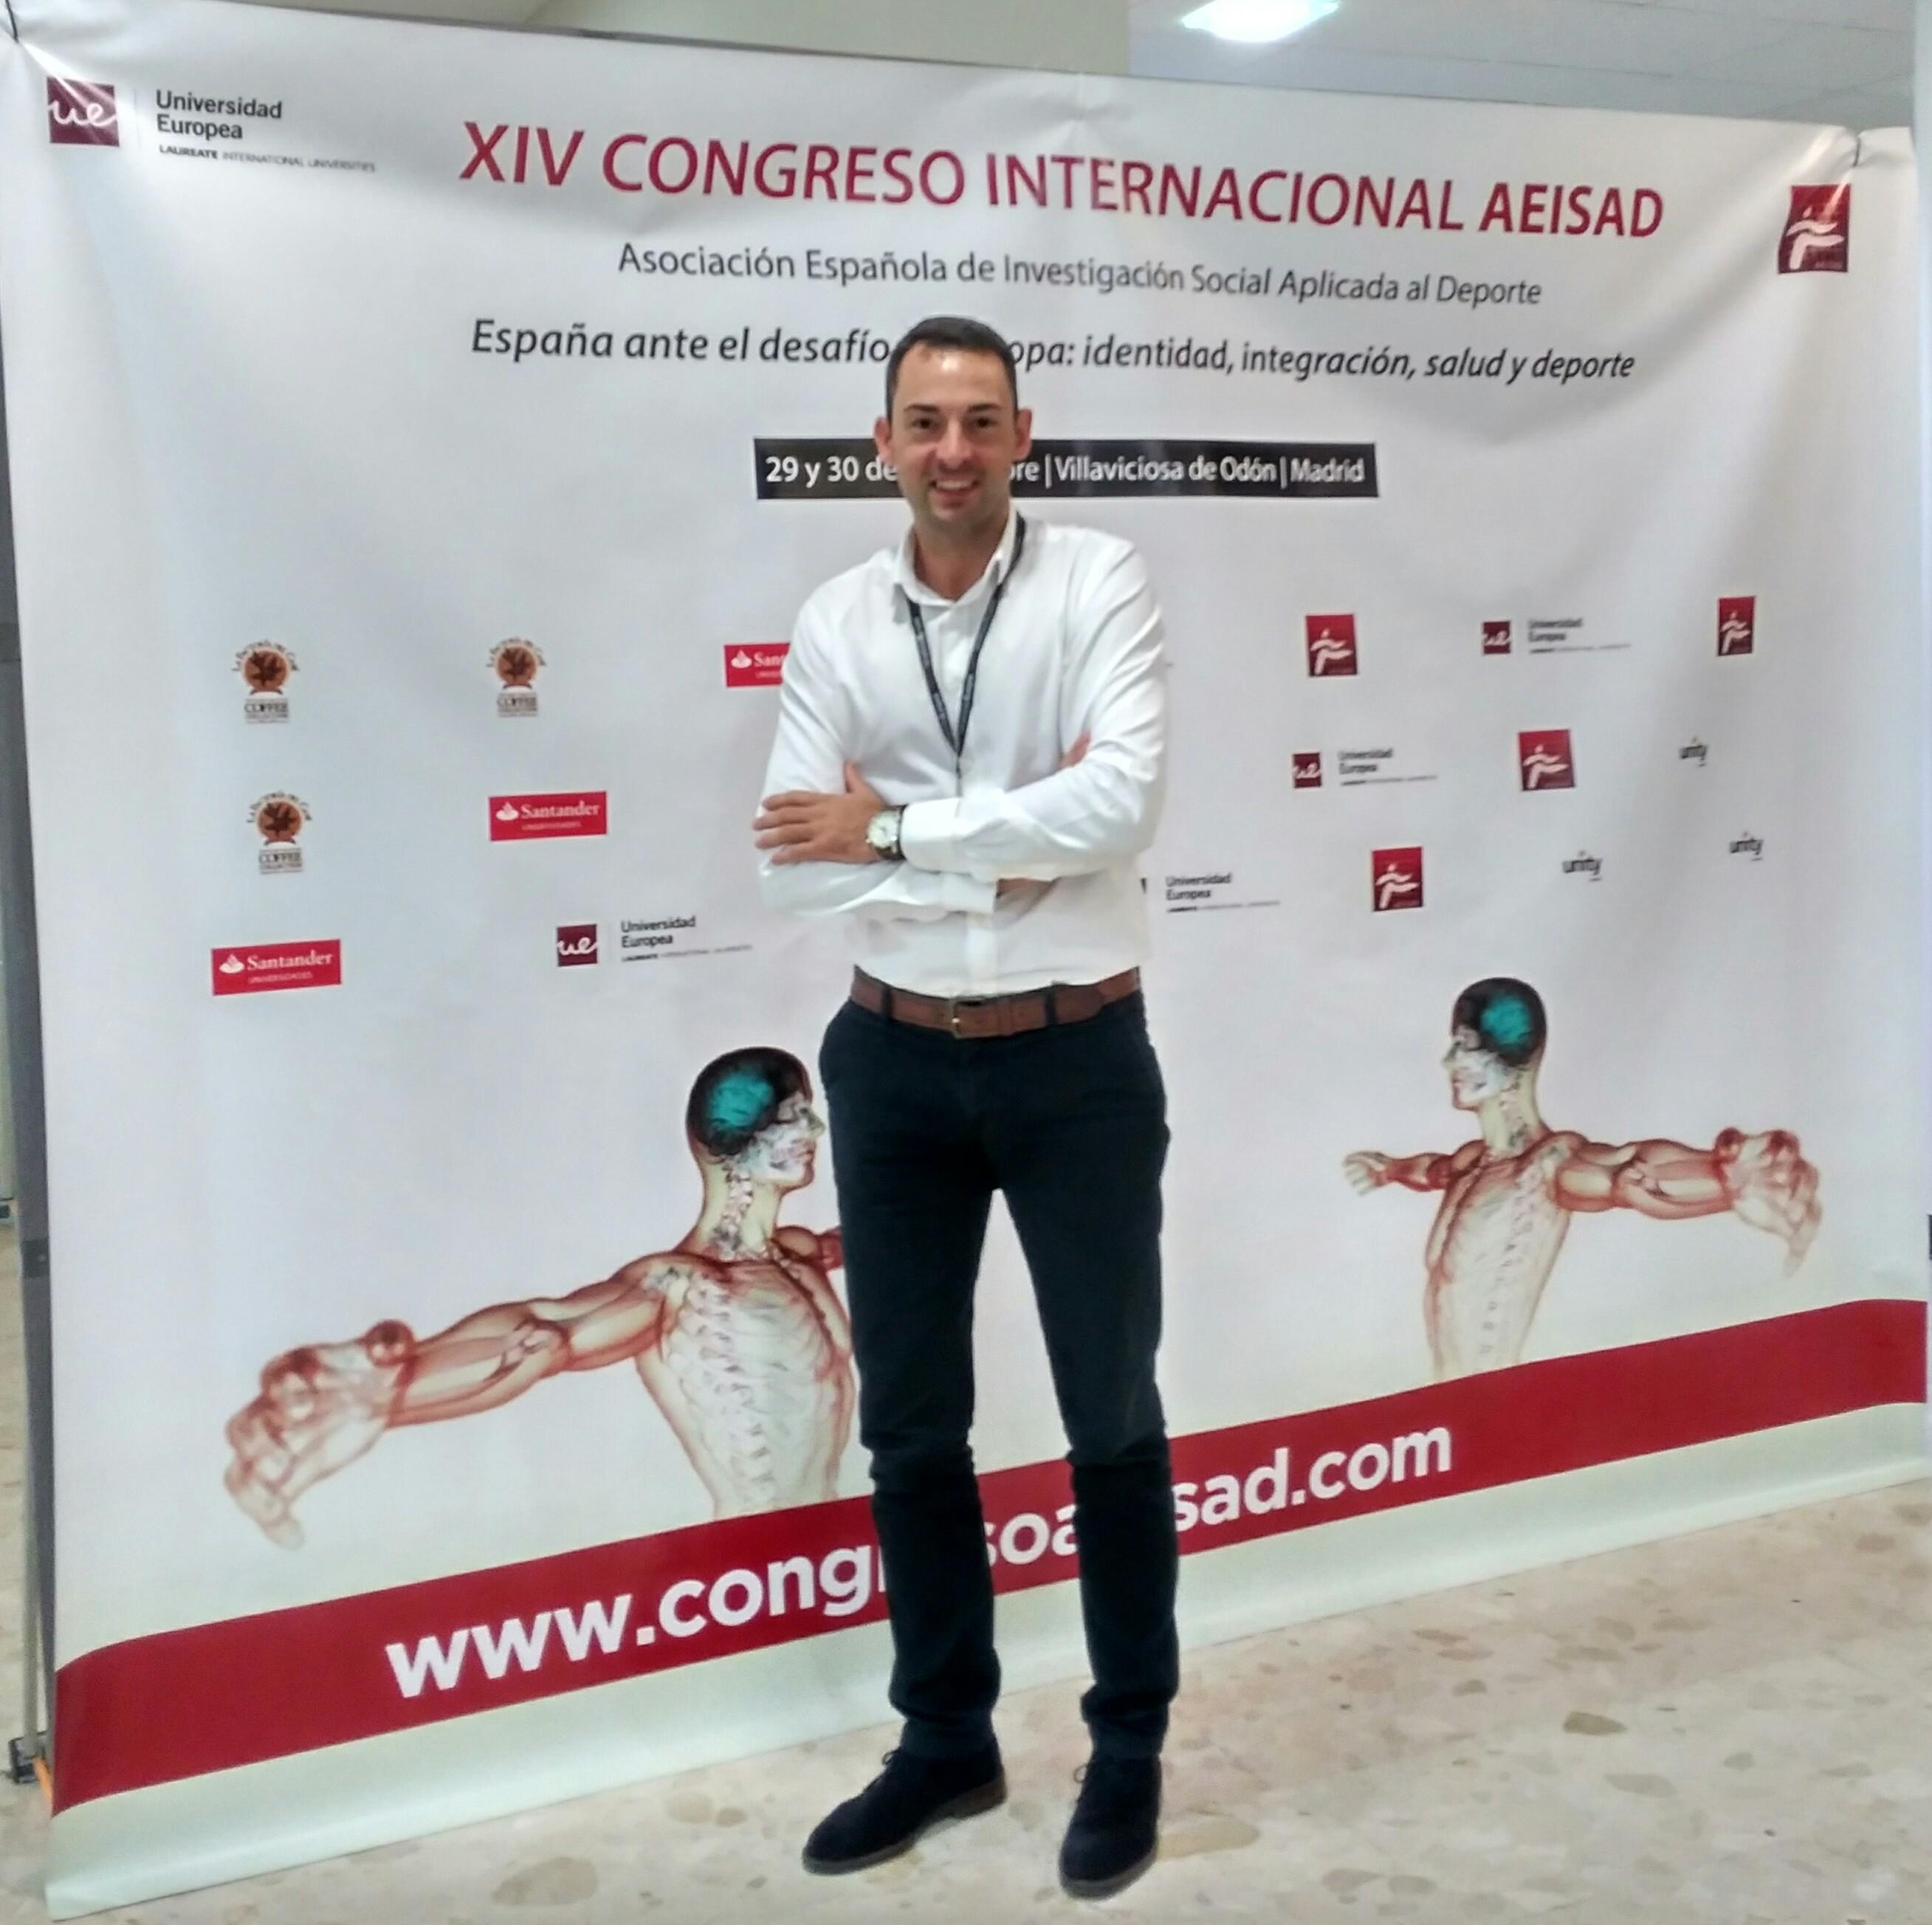 Adrià Martín, director de CAFE d'EUSES-UdG, participa en el 14è Congrés Internacional AEISAD a Madrid